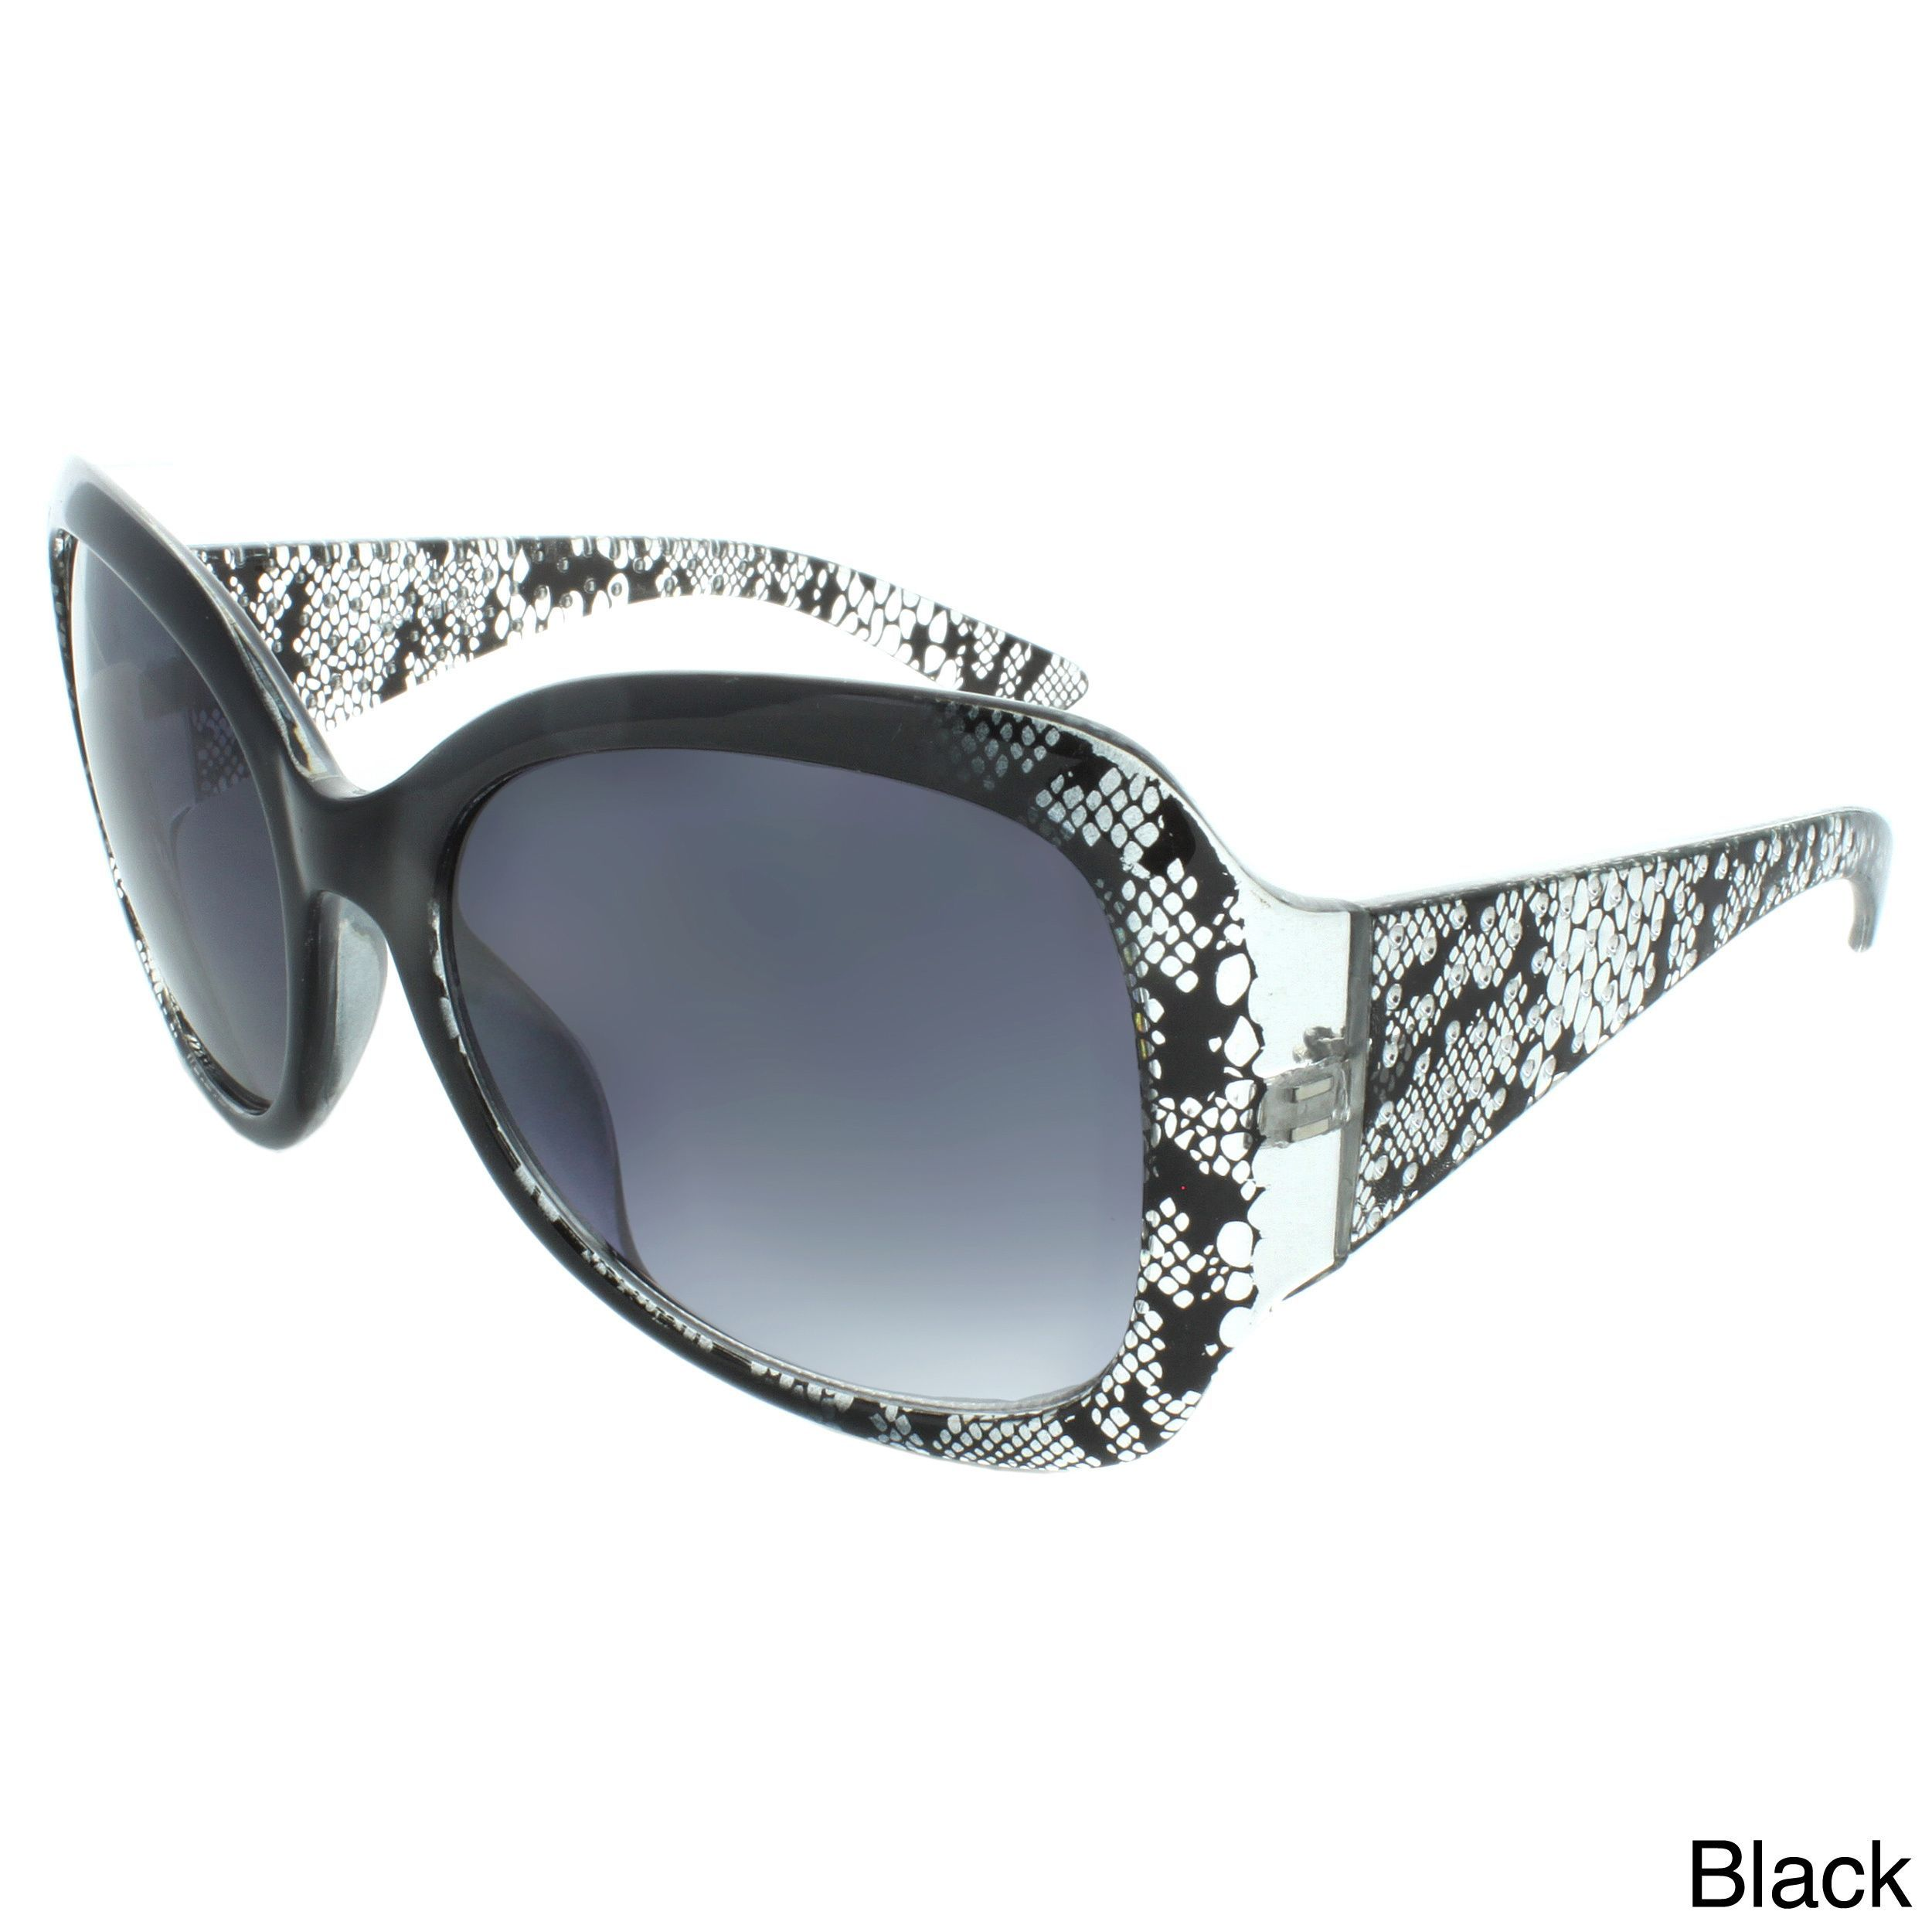 Epic Eyewear Women's 55mm Sunglasses